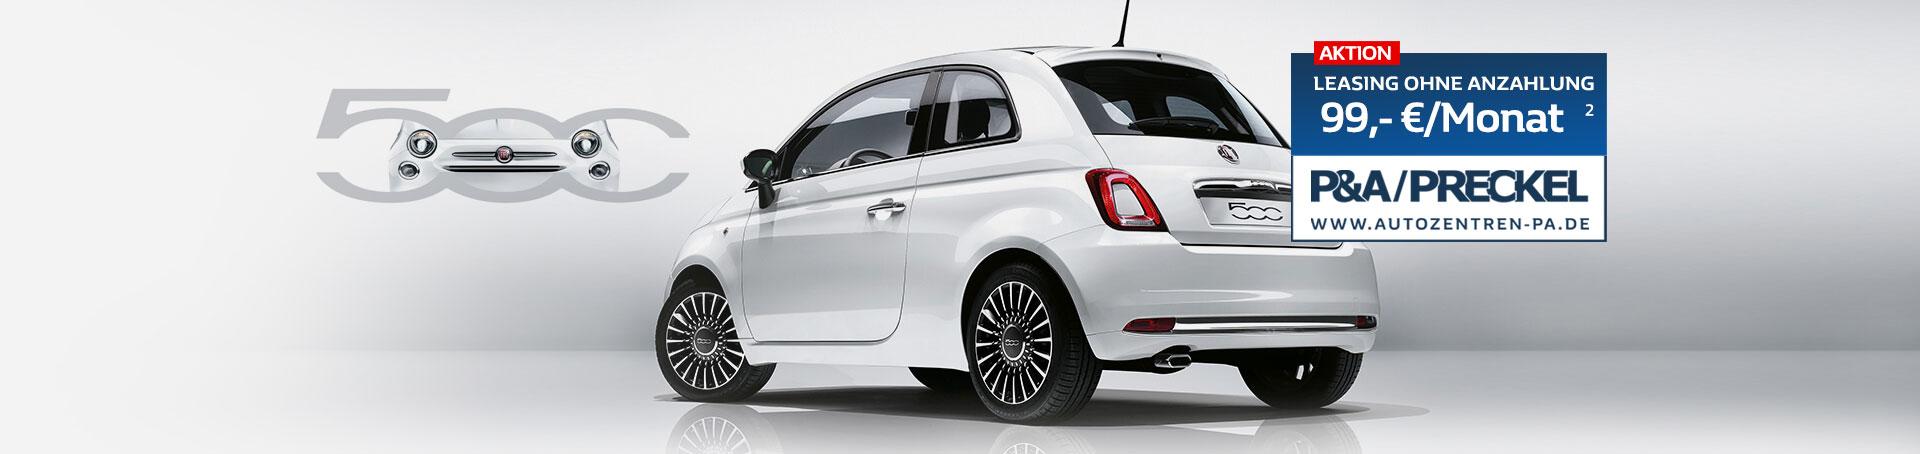 Fiat 500 Leasing 99 Euro pro Monat